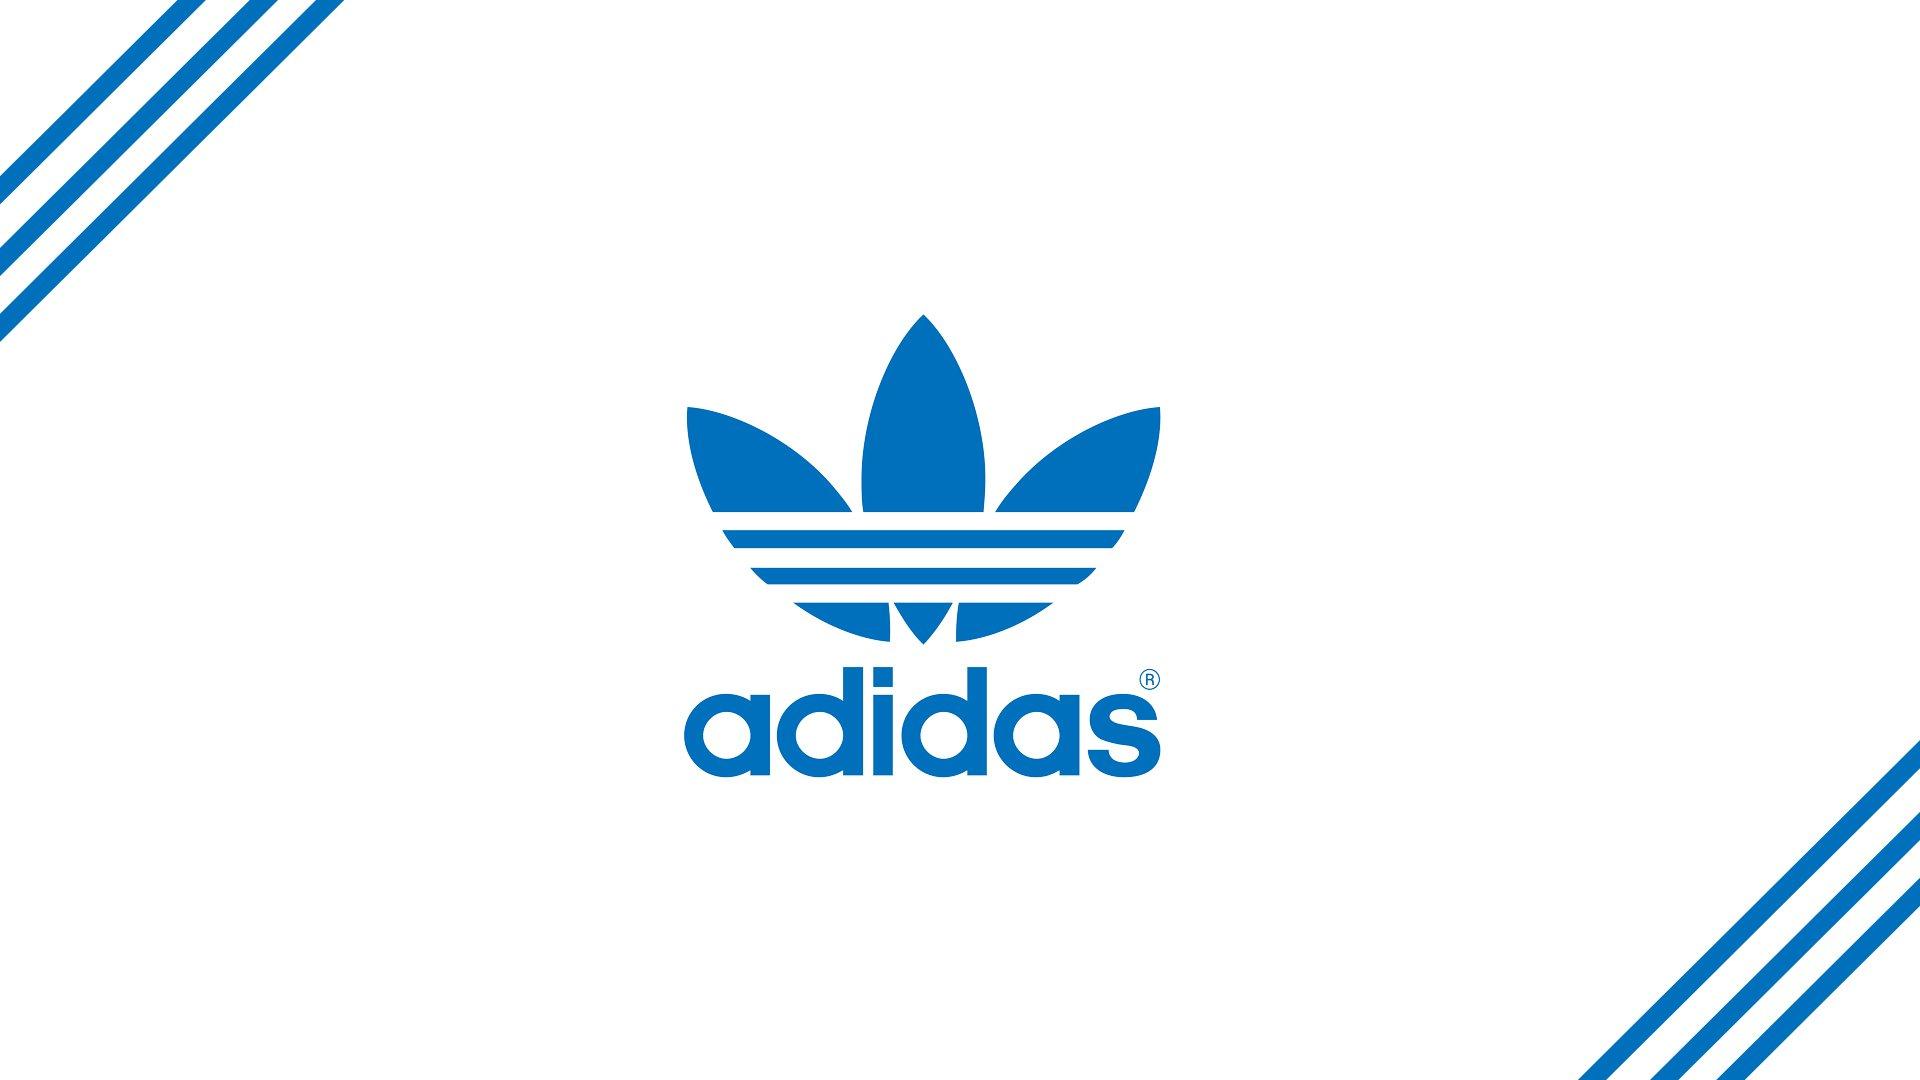 Free Download Adidas Original Wallpaper 136988 1920x1080